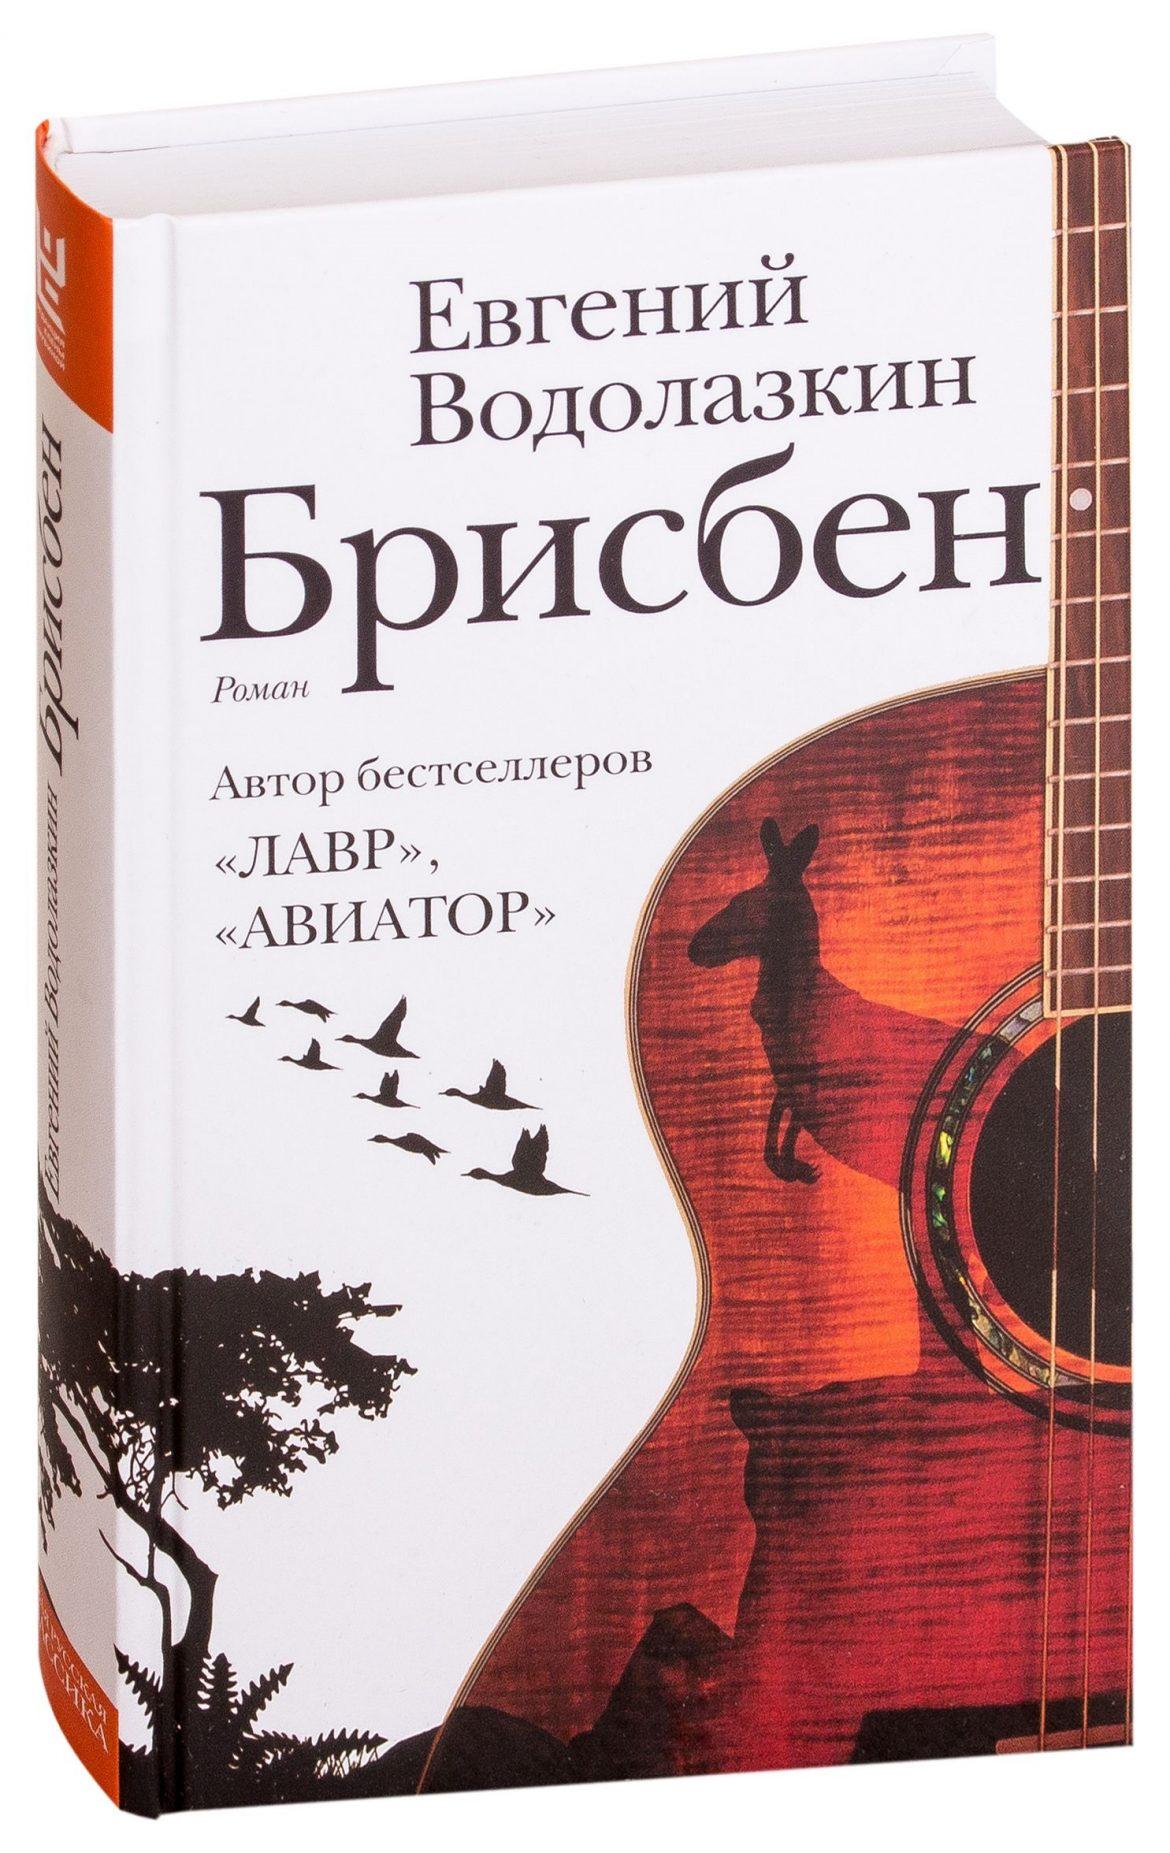 Брисбен — Евгений Водолазкин